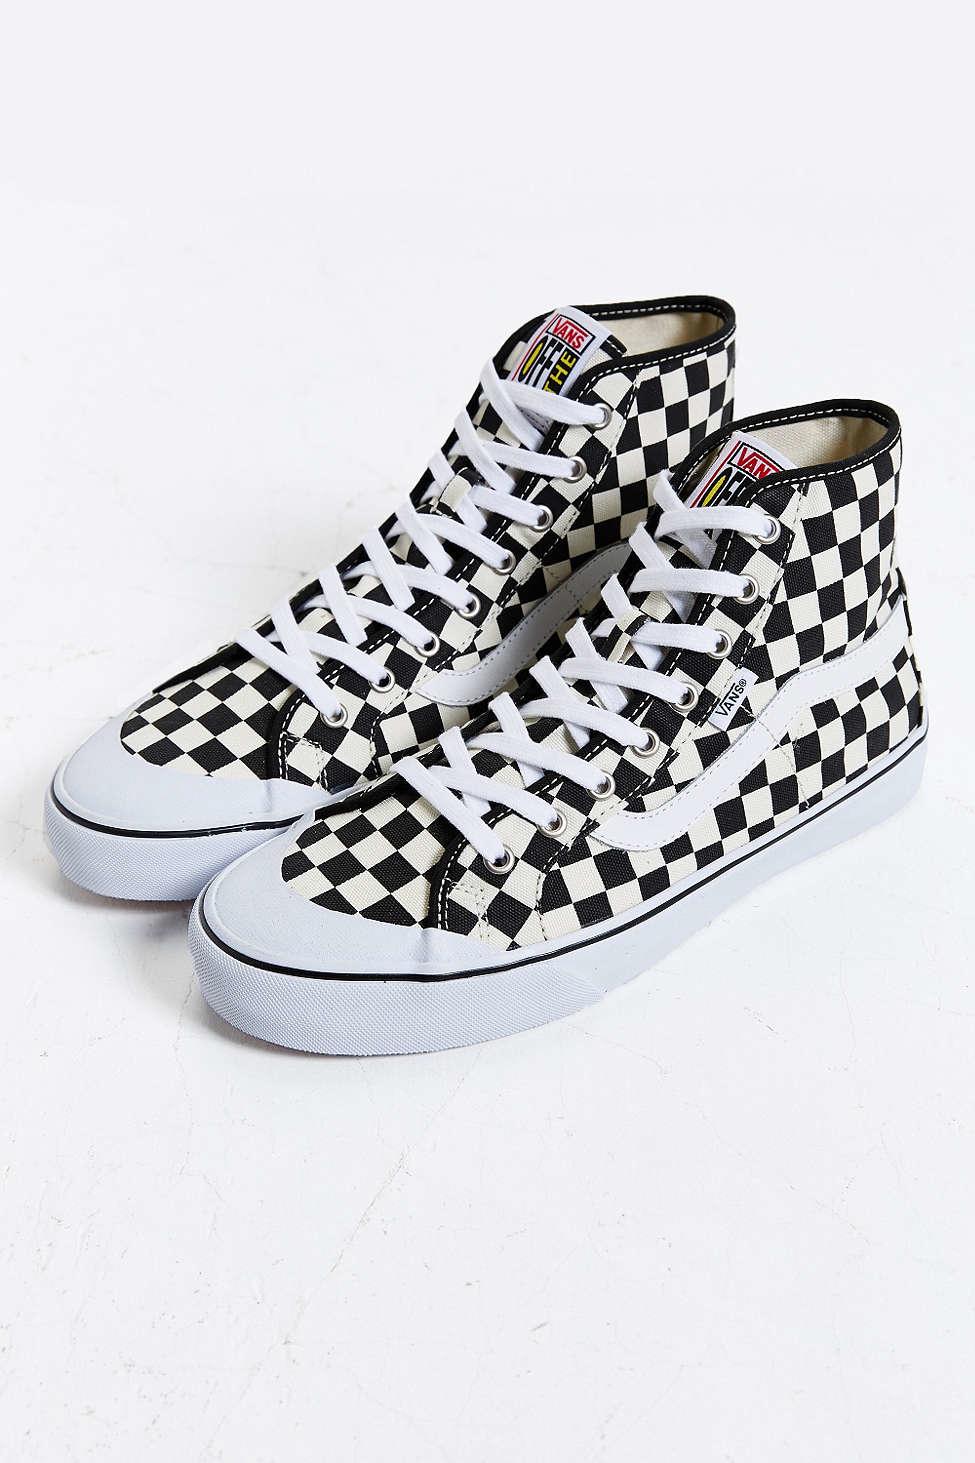 Lyst - Vans Black Ball Hi Sf Checkered Sneaker in White ...  Lyst - Vans Bla...